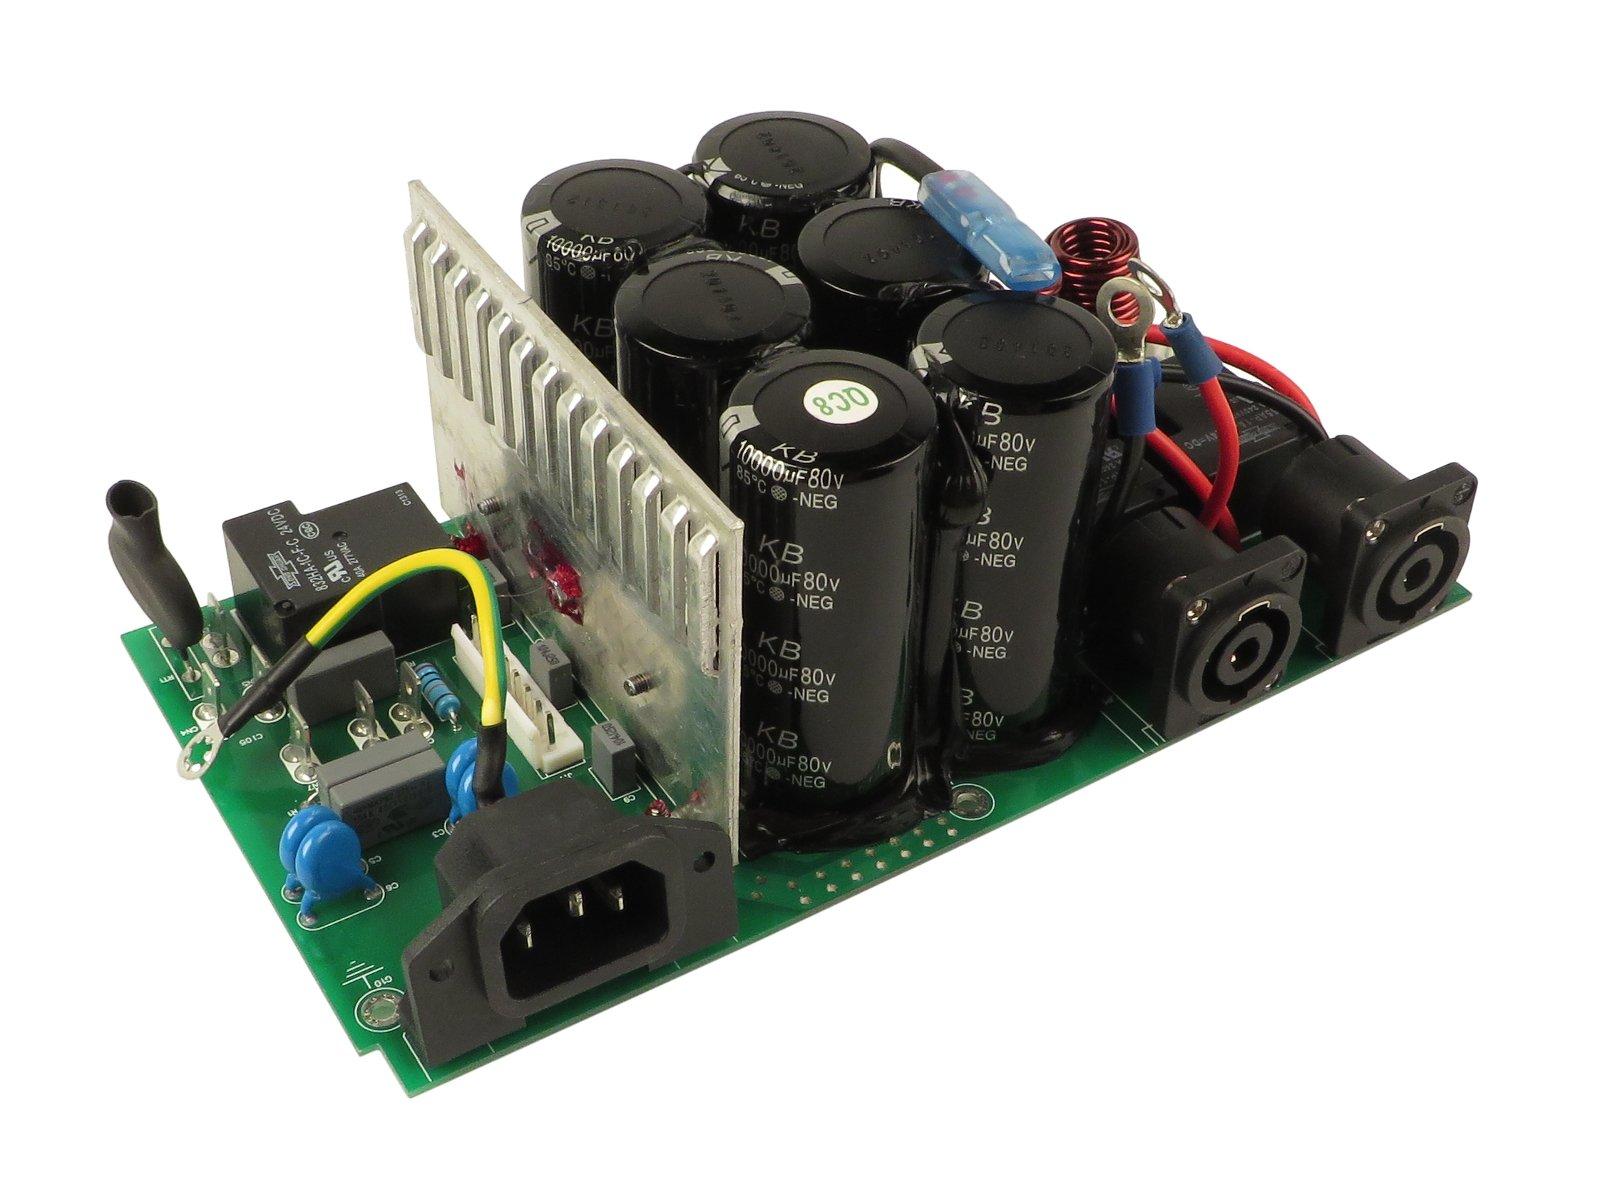 Power Supply PCB for XLi 3500